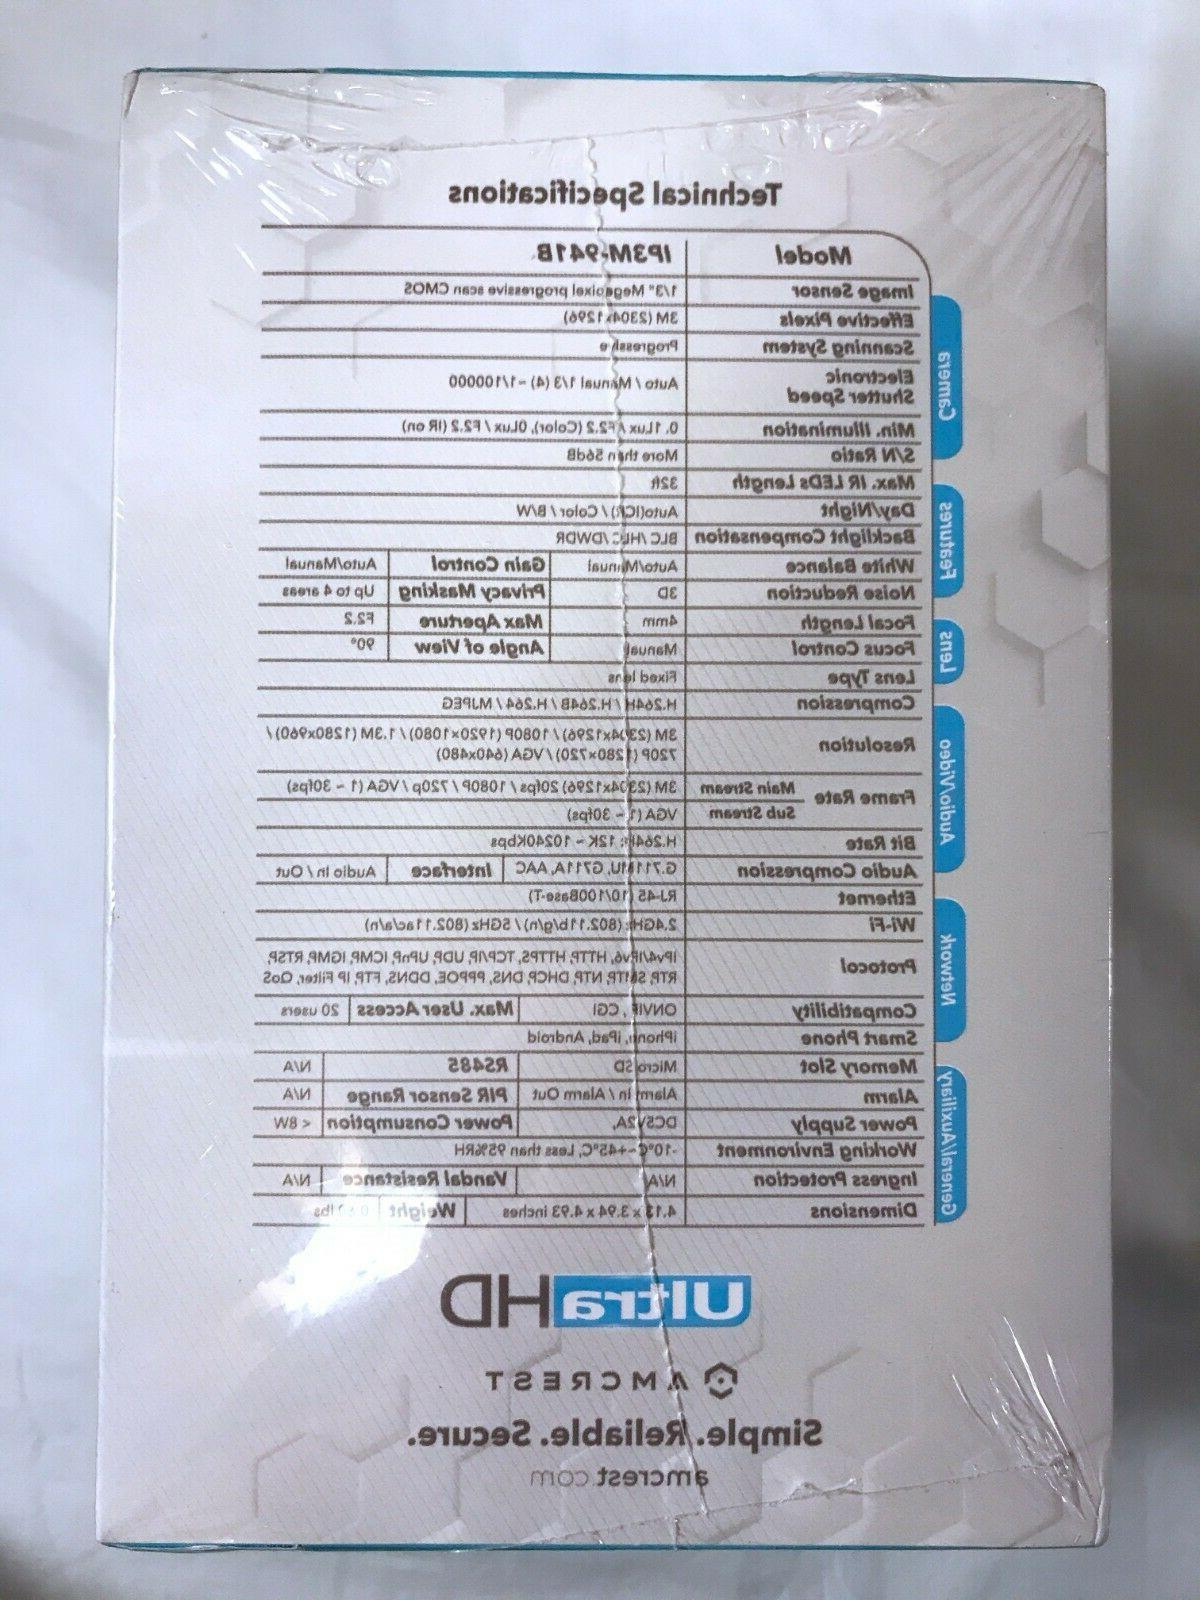 Amcrest UltraHD IP3M-941B, NEW in unopened